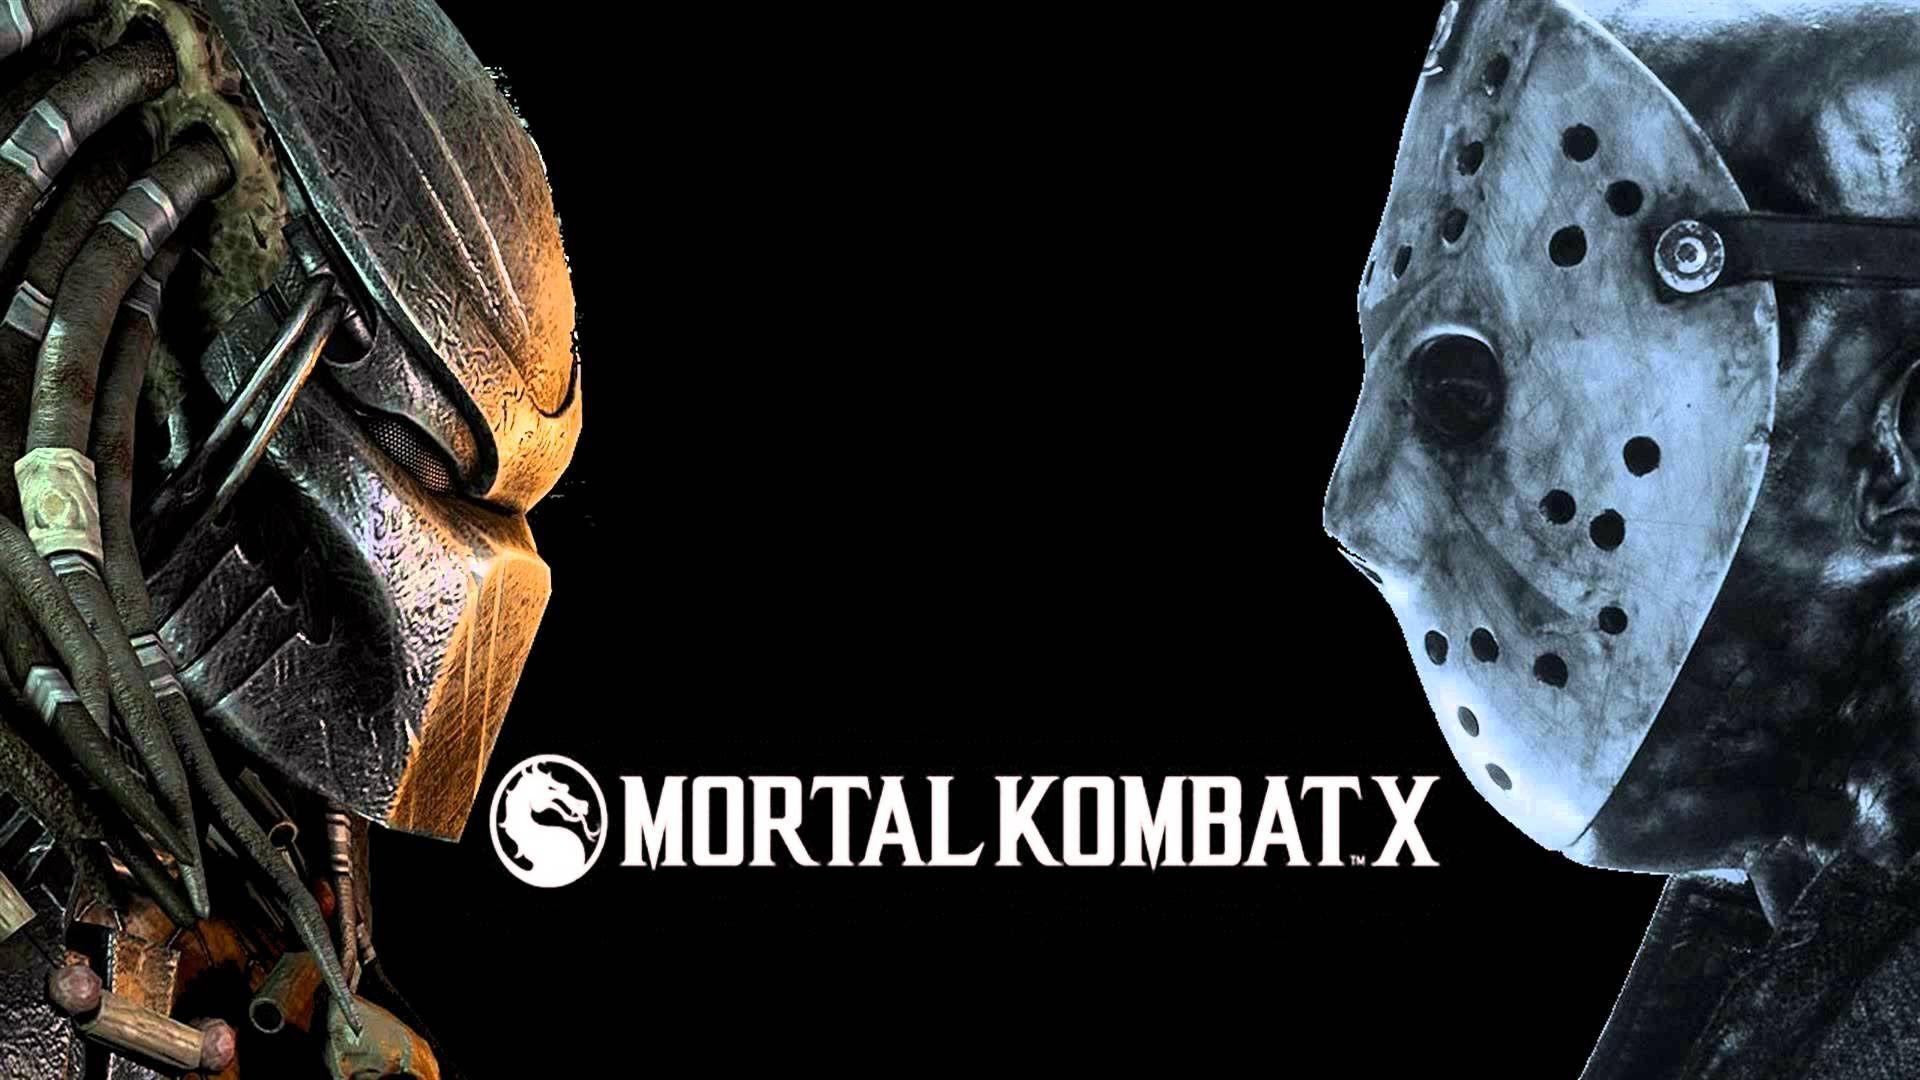 Youtube Mortal Kombat X Mortal Kombat Pc Scorpion Mortal Kombat